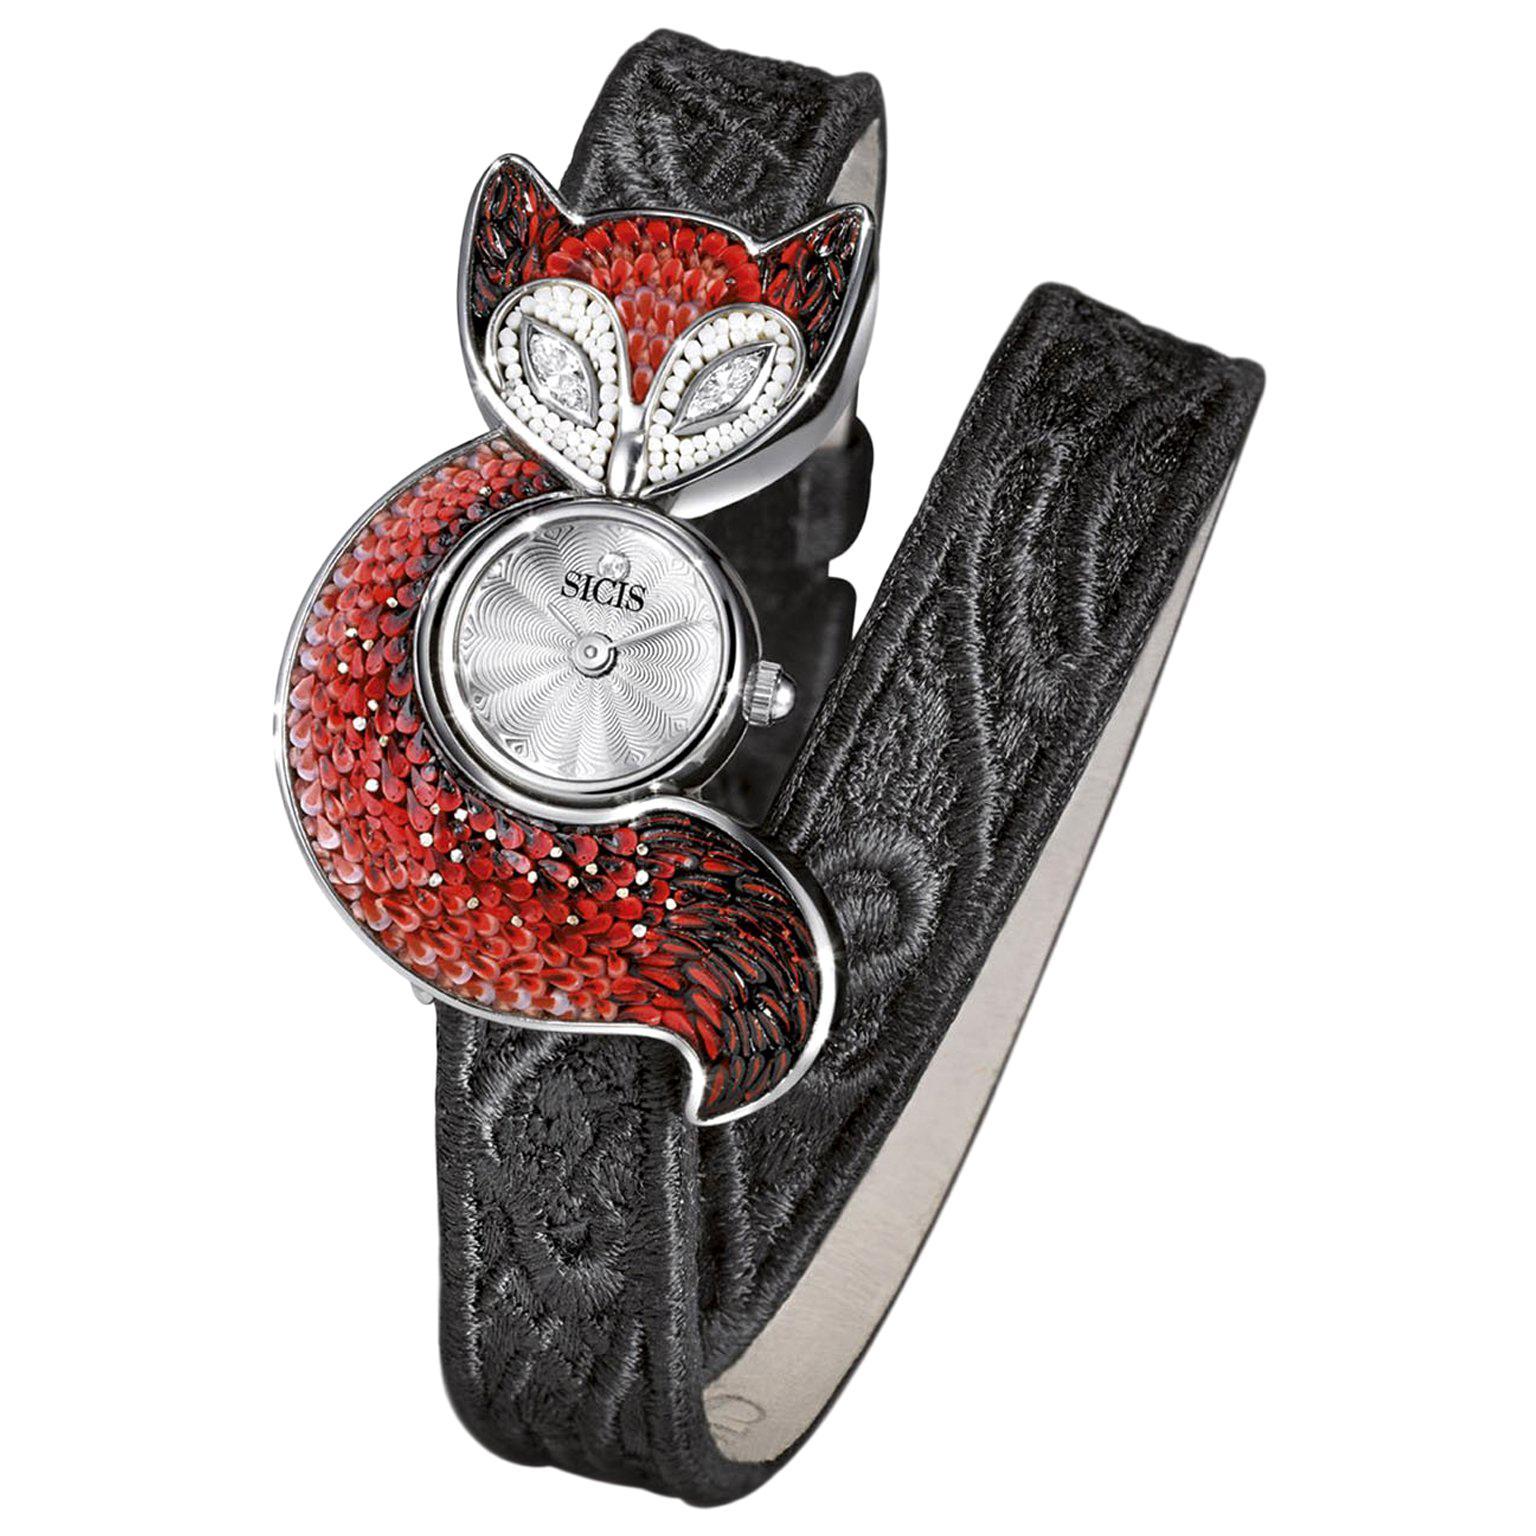 Stylis Wristwatch Steel Case White Diamond Handmade Decorated Micromosaic